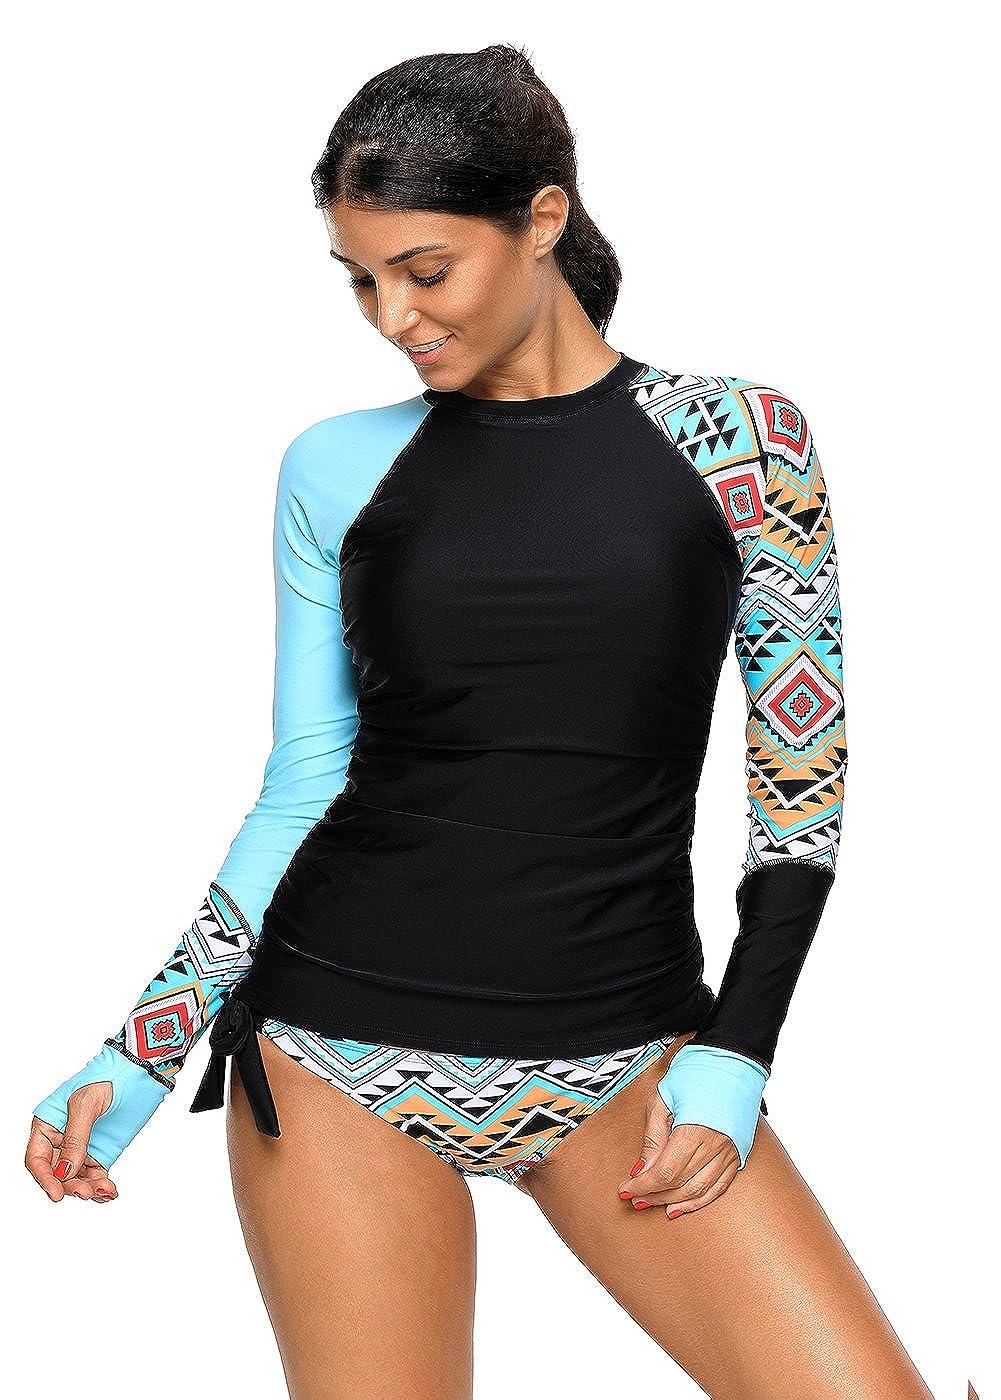 Shawhuwa Womens Long Sleeve Vibrant Print Rash Guard Swim Shirt Tankini Swimsuit S2A410485